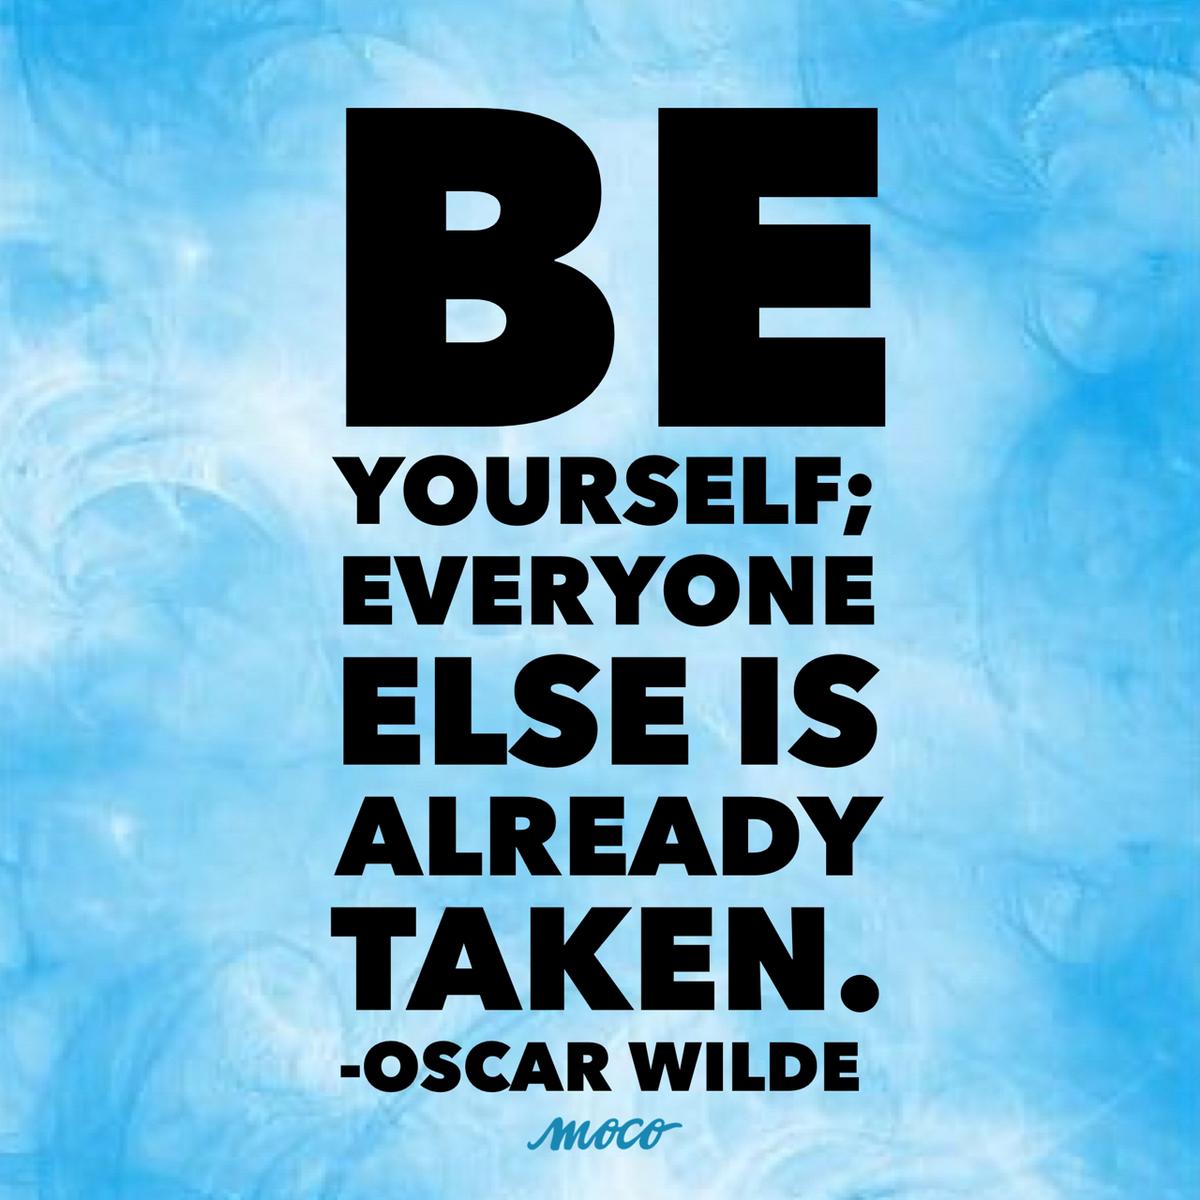 Embrace Your Giftedness: Monday MOtivation - https://mailchi.mp/7ace34276103/embrace-your-giftedness-monday-motivation… #useyourgifts #mondaymotivation #unique #gifted #beyourself #mocoleadership #blog #focusonthegood #highvibes #liveinspired #mindset #growth #selfawareness #motivation #selfleadership #personalgrowth #qotd #growpic.twitter.com/O7WUCnHnL3